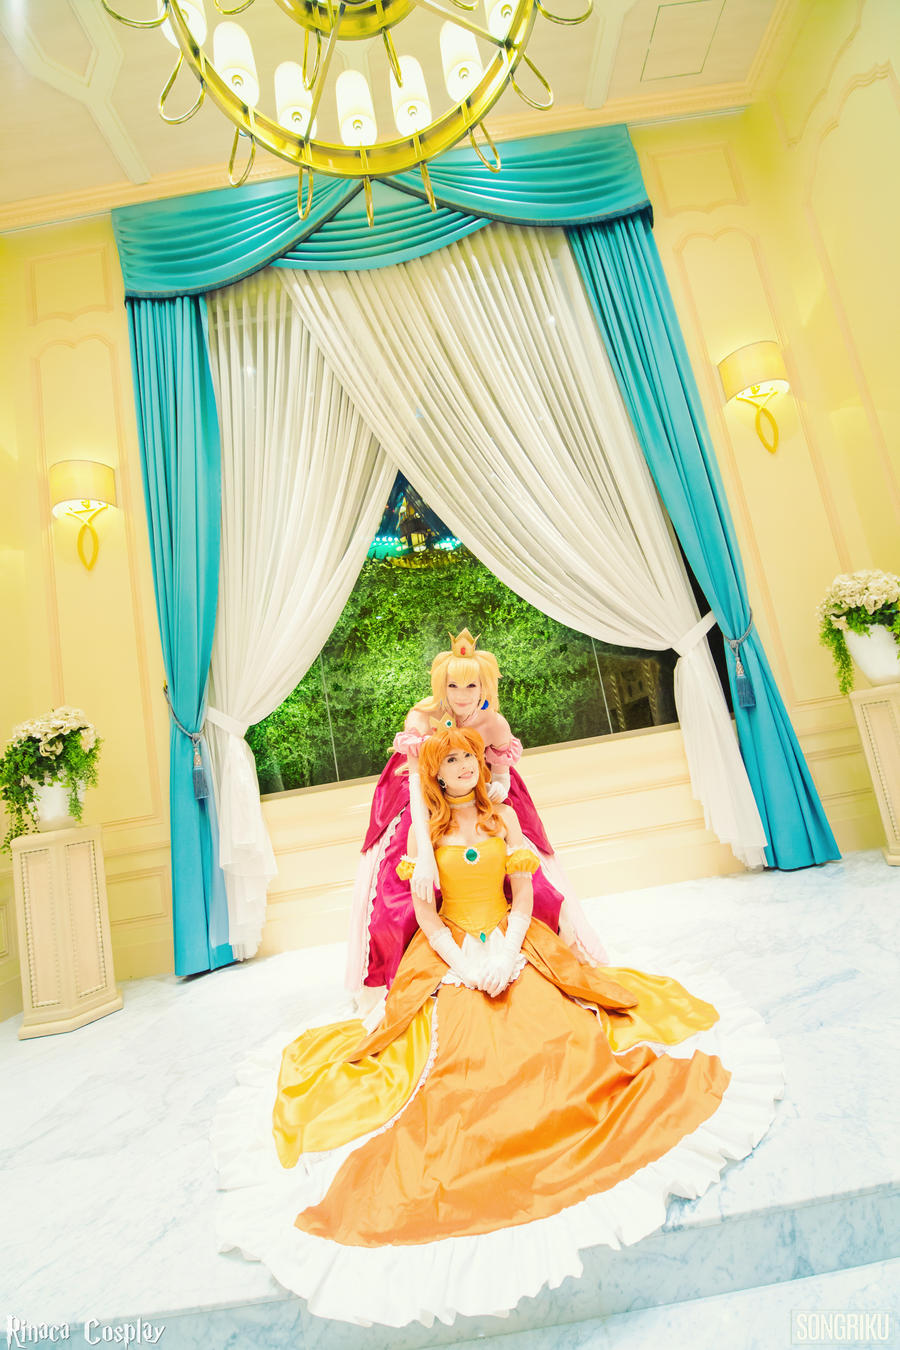 Princess Daisy of Sarasaland